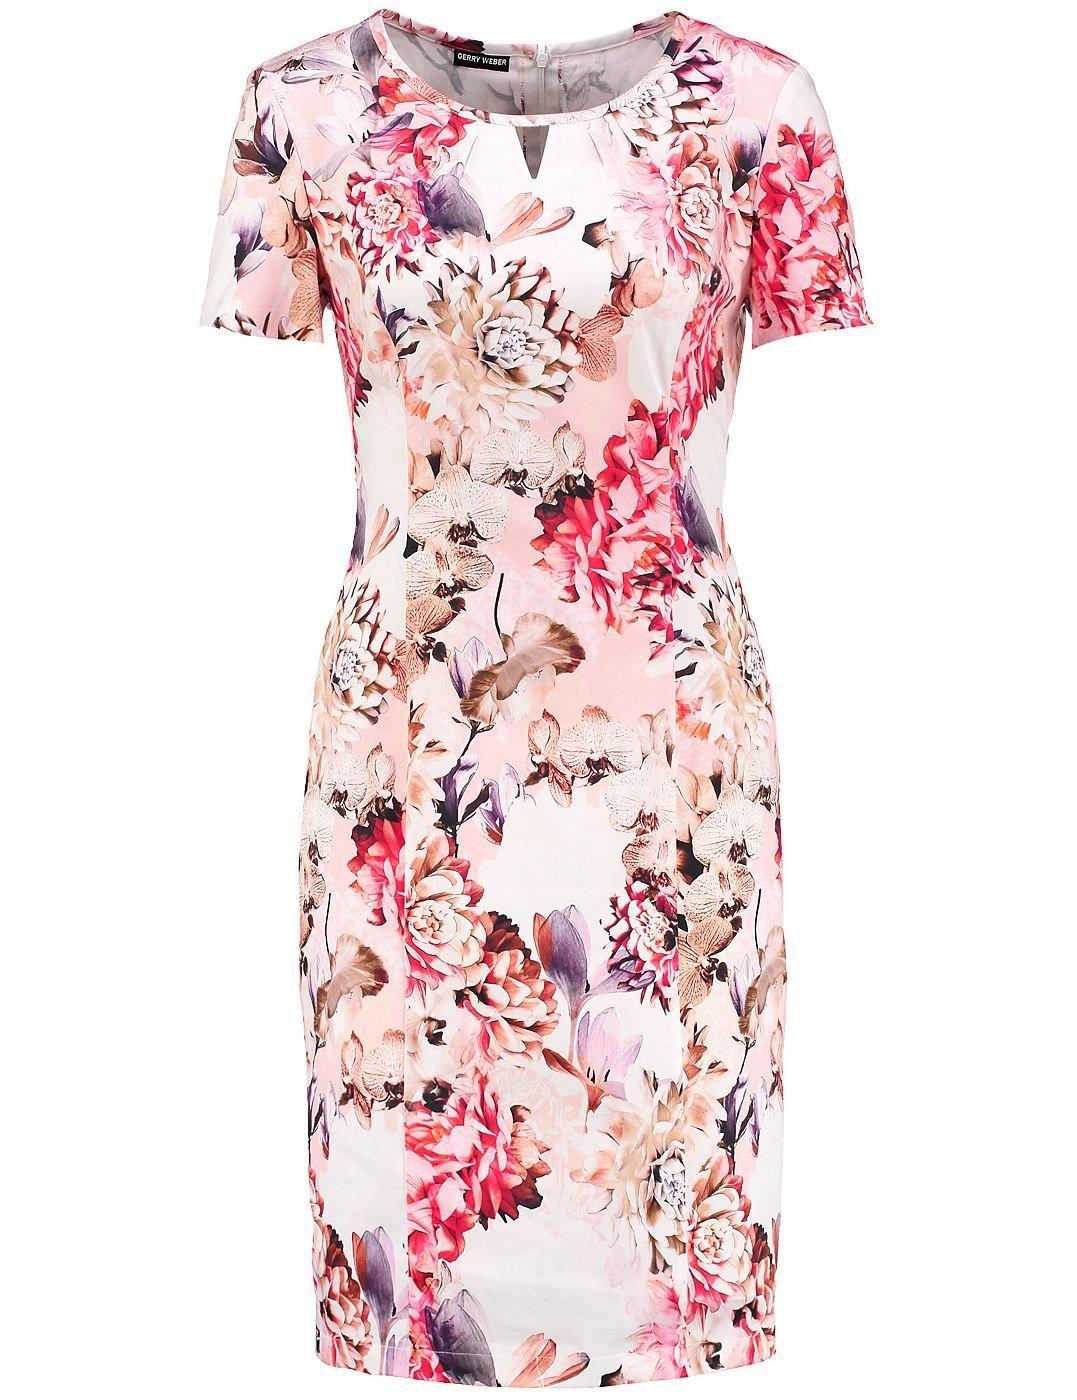 Gerry Weber Kleid Langarm Kurz Kleid Mit Feinem Alloverdessin Fashion Fashion Outfits Dresses